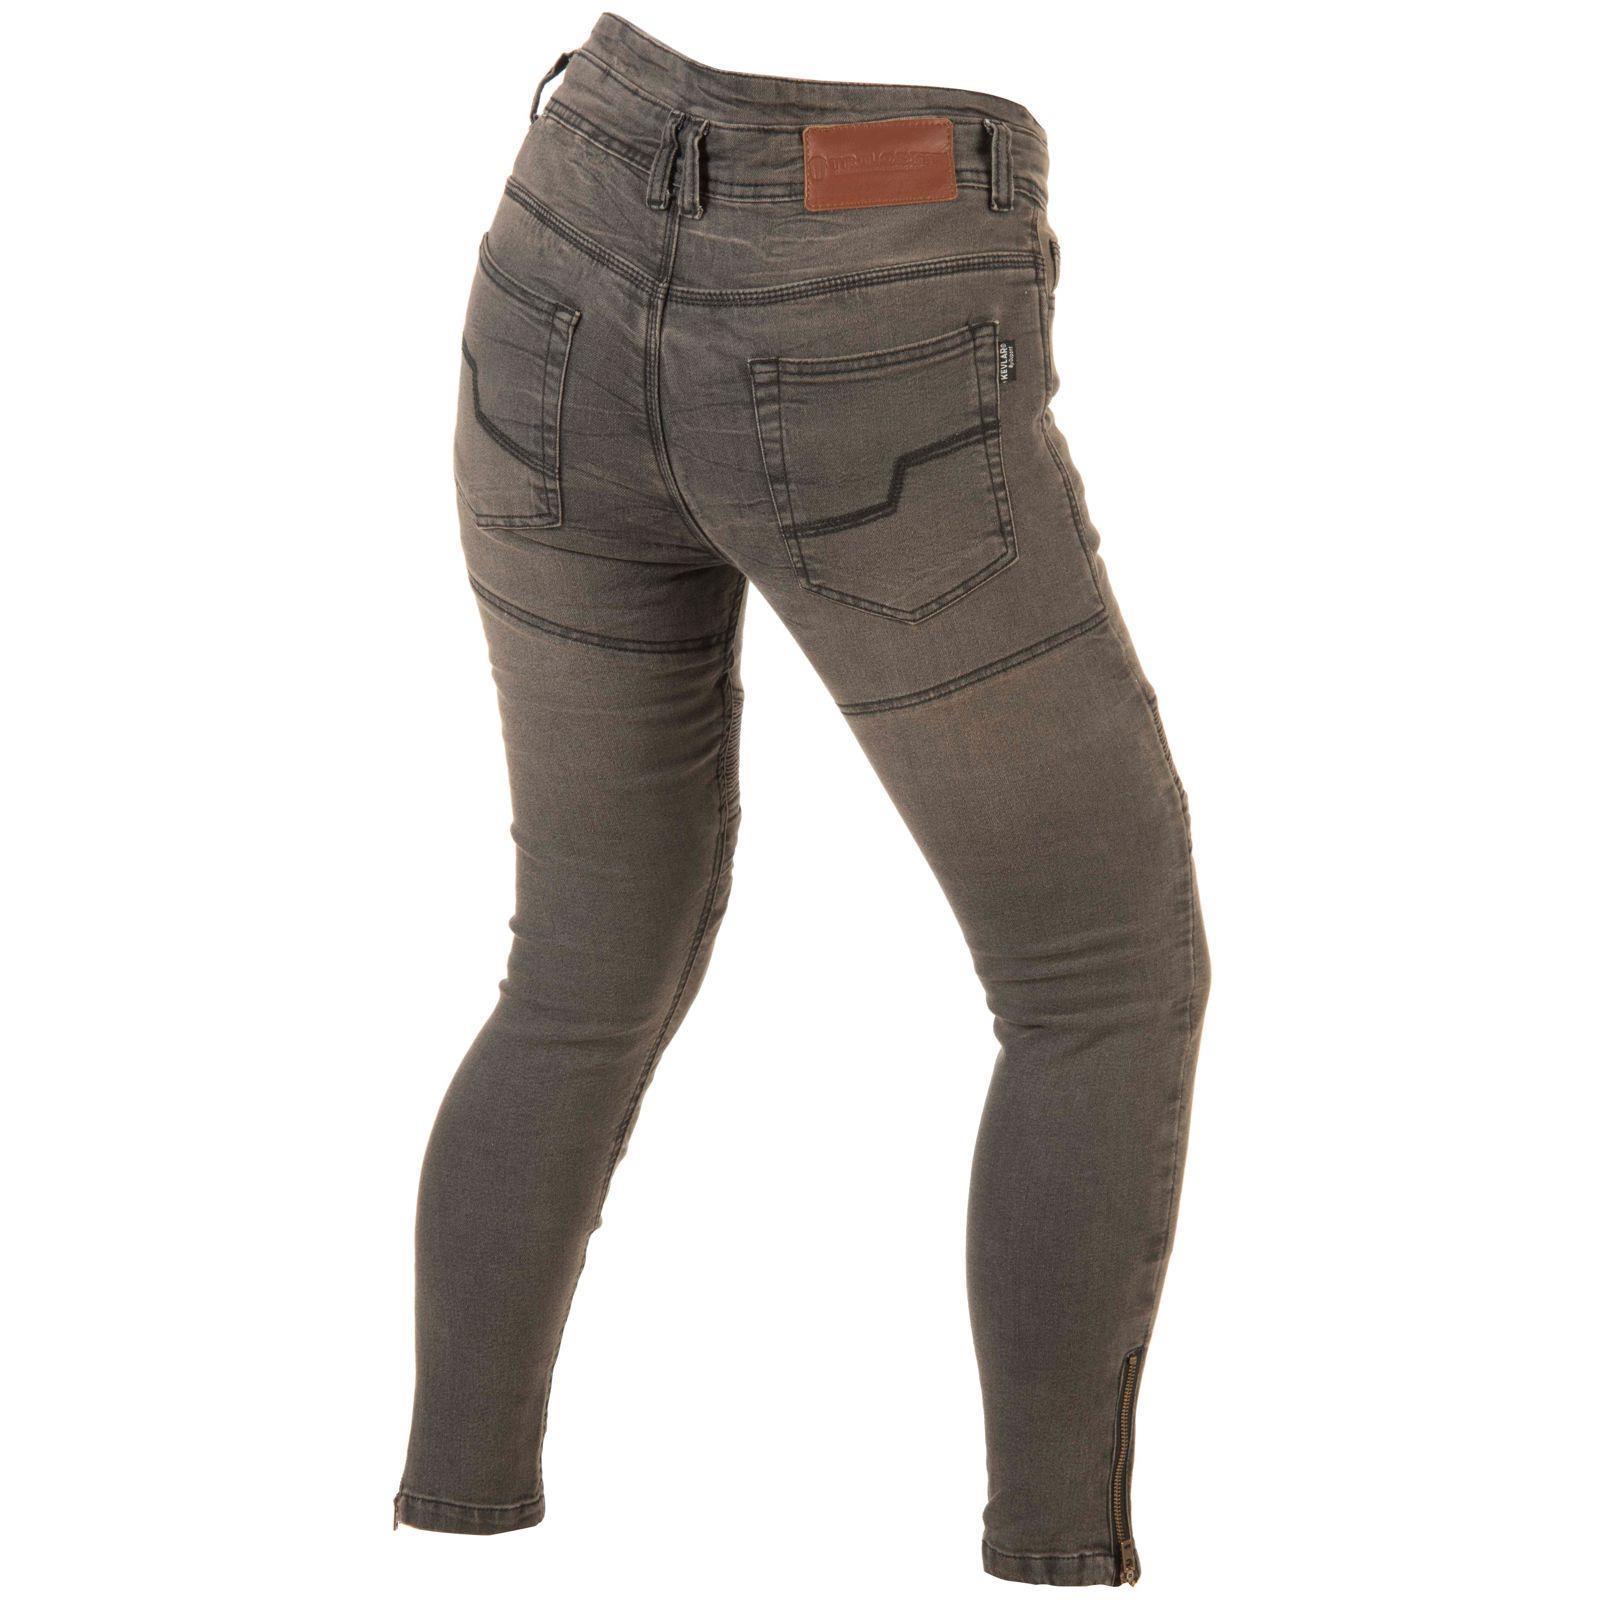 Trilobite-Pantaloni-Moto-Jeans-Abbigliamento-Parado-MICAS-URBAN-DUAL-PANTS-ACID miniatura 98